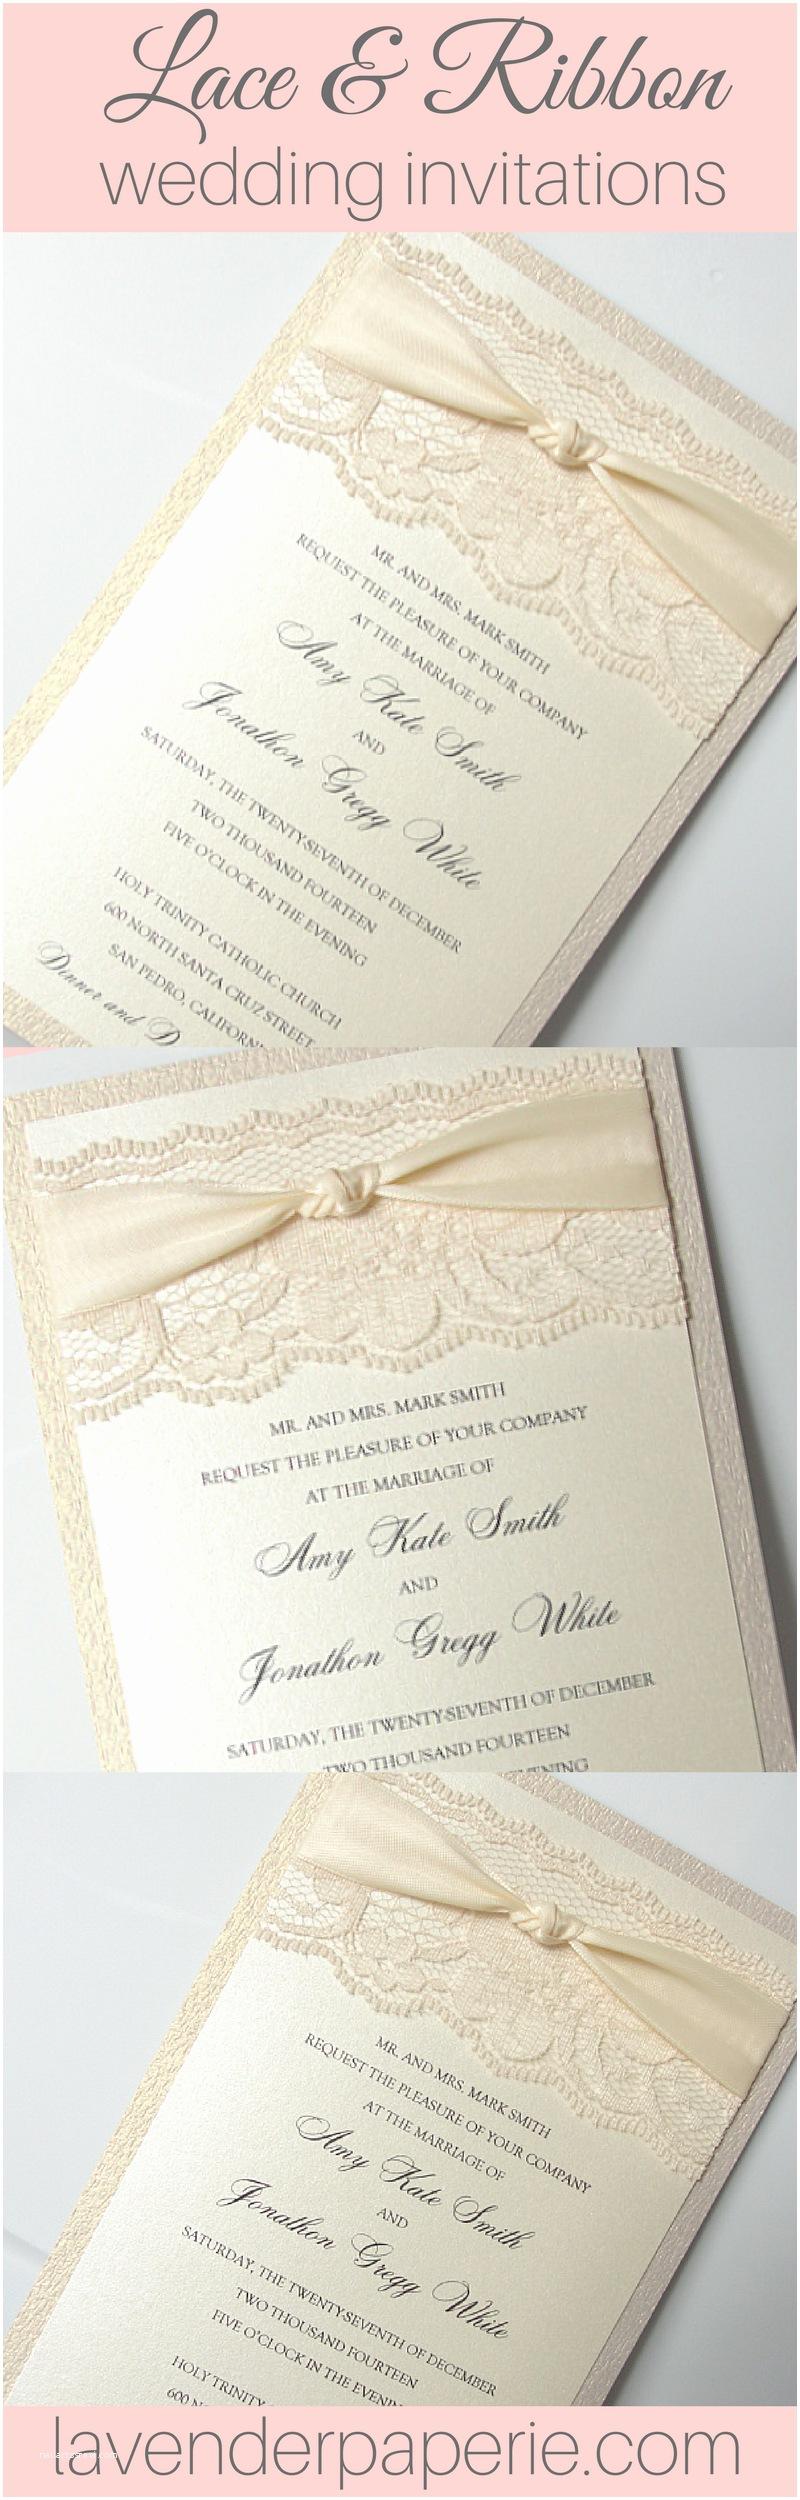 Wedding Invitations Under $1 Lace Wedding Invites Lace Wedding Invitations